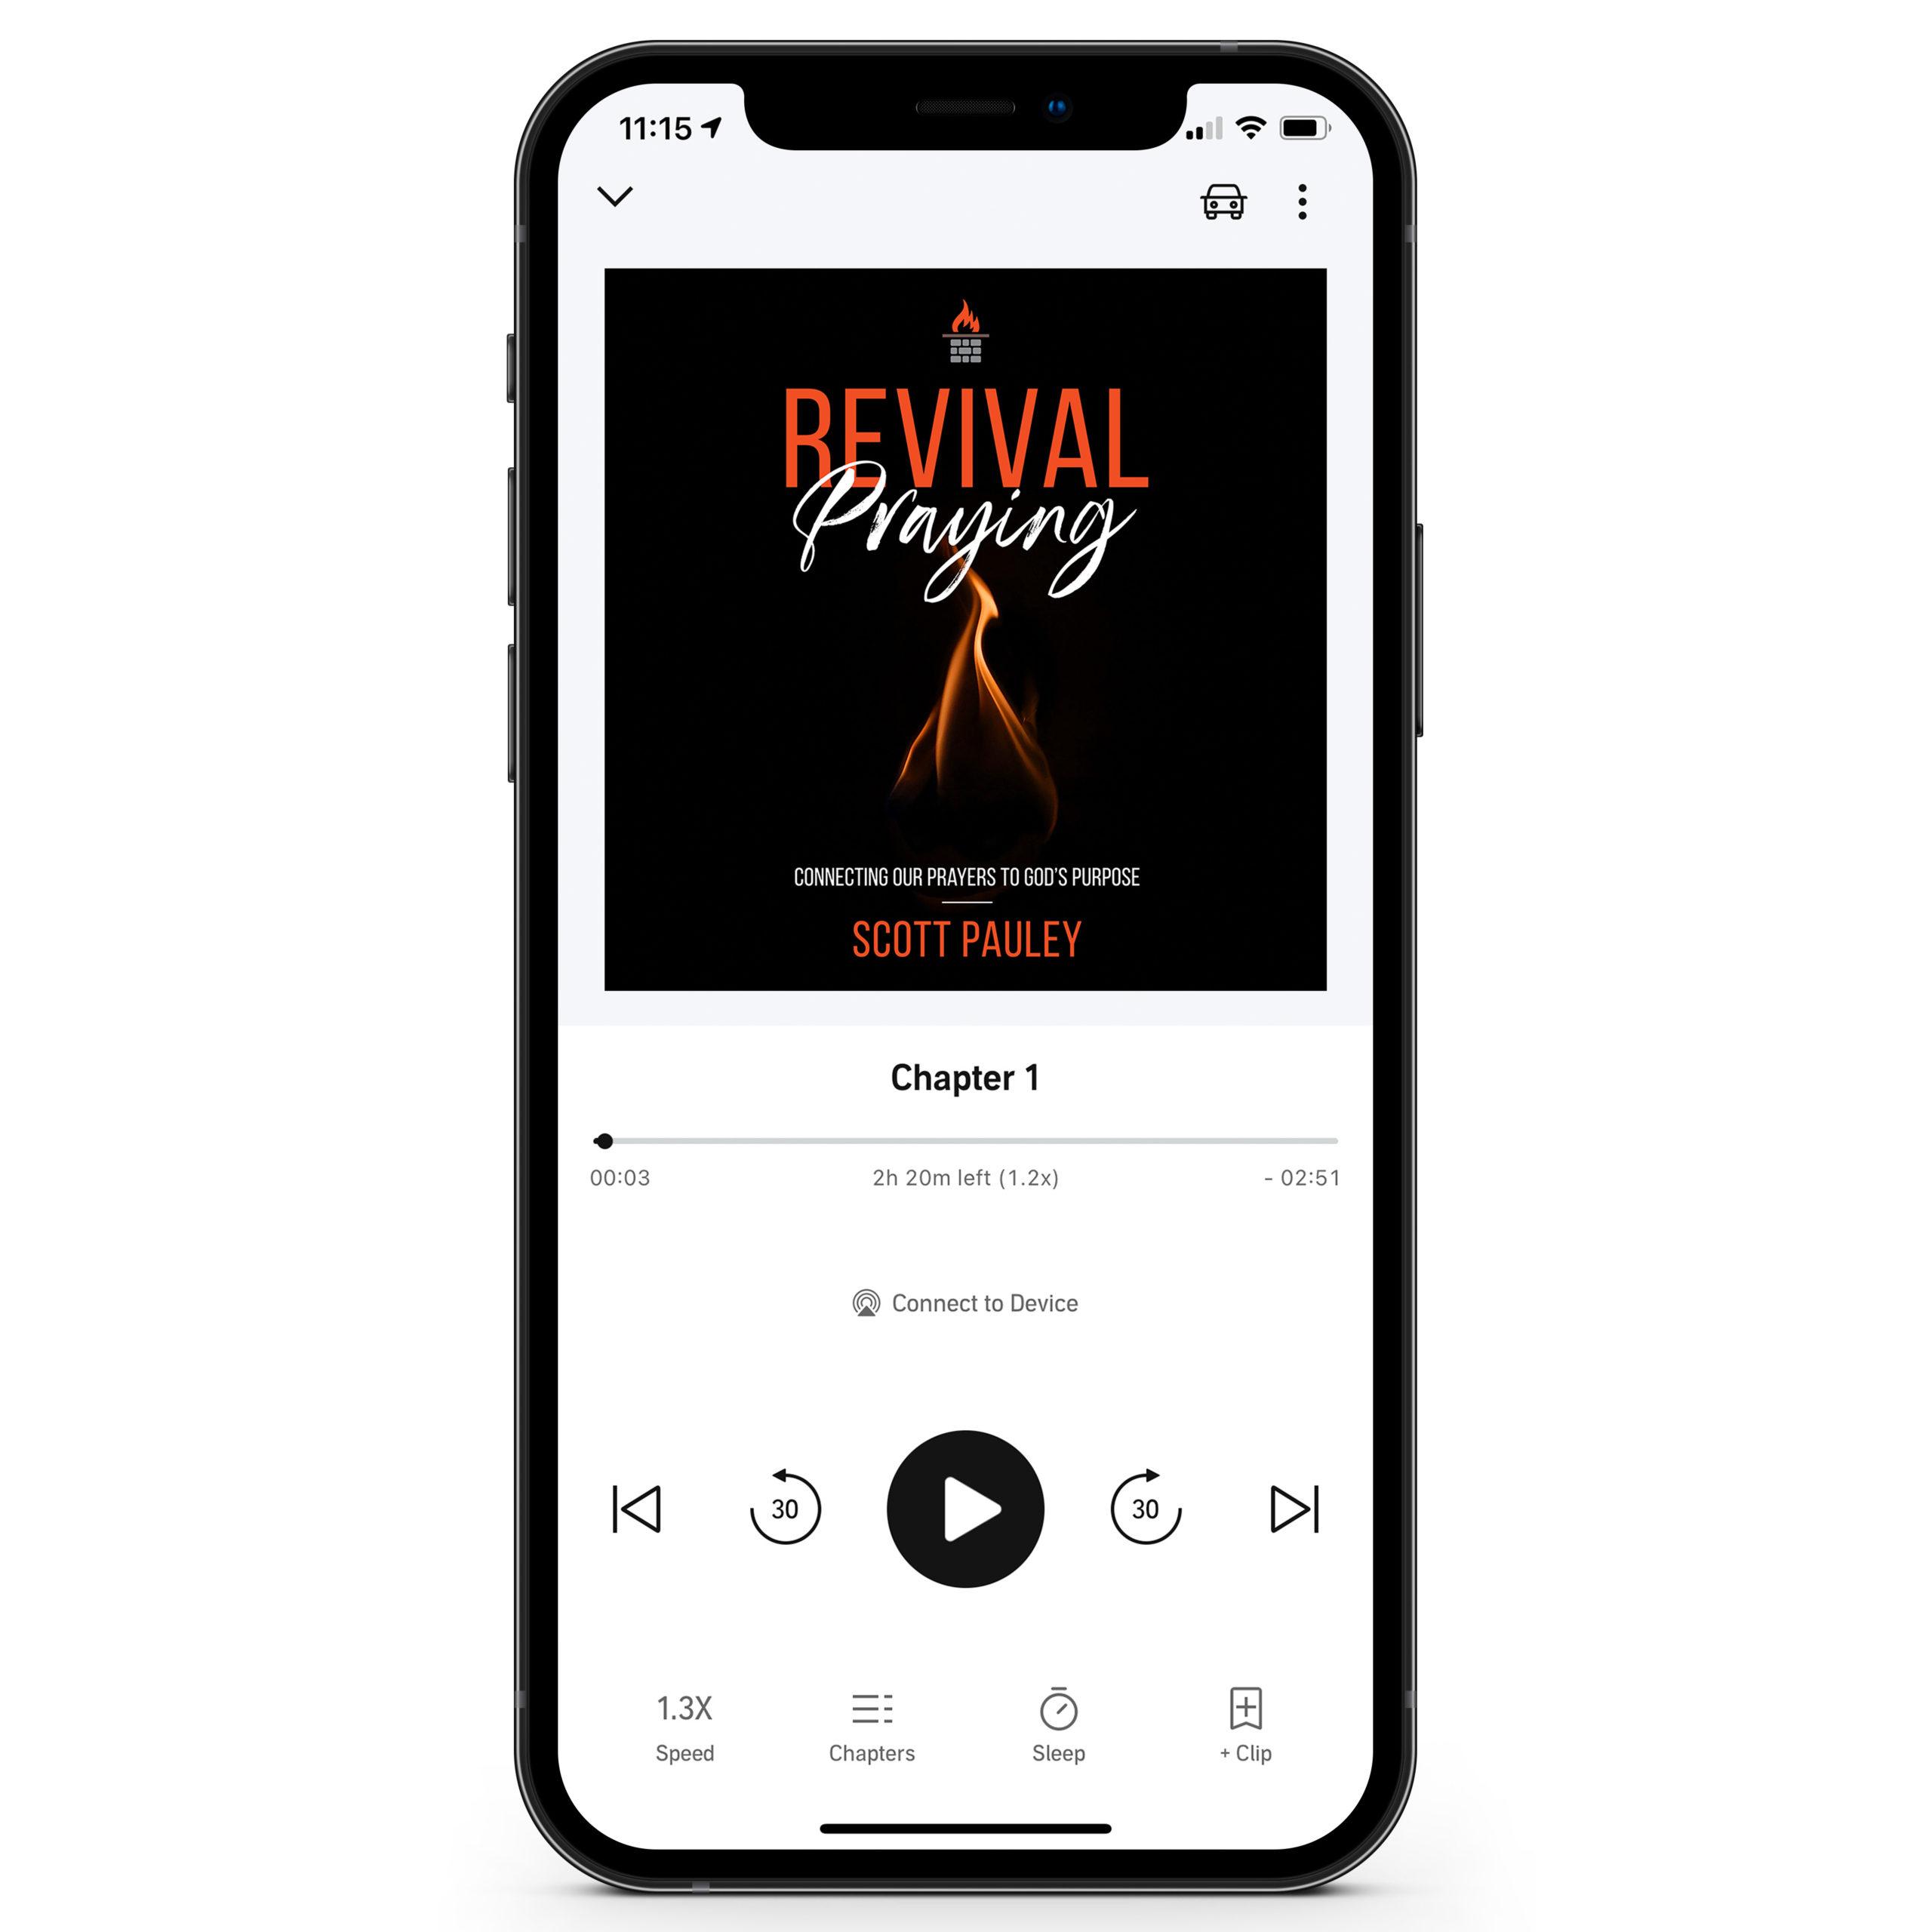 Revival-Praying-Audiobook-iPhone-12-Pro-Mockup